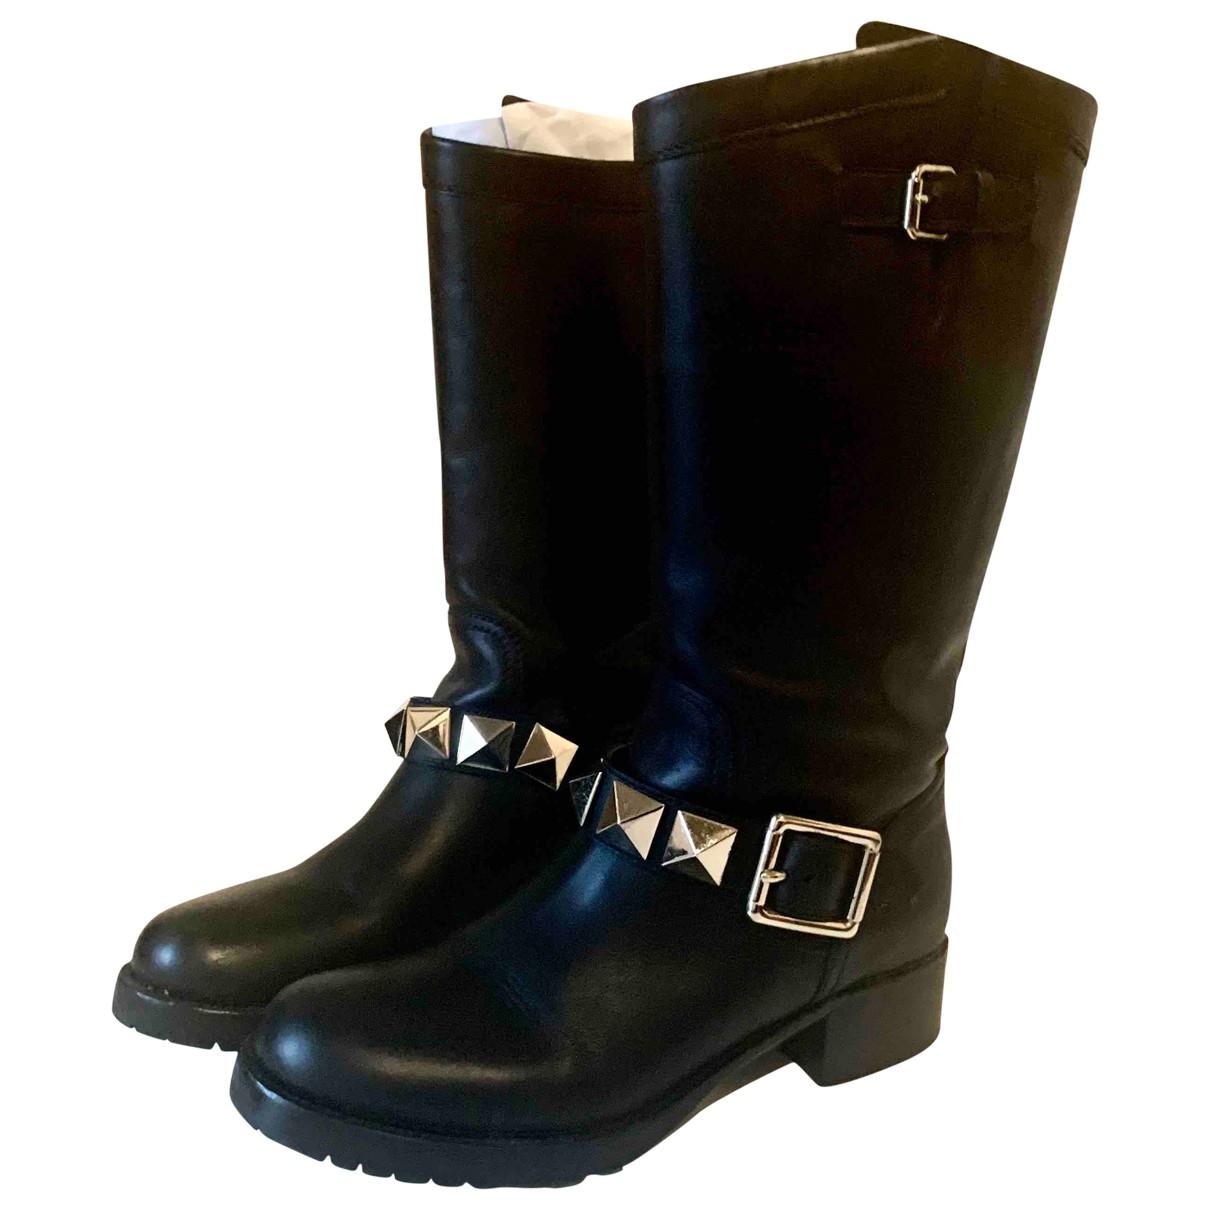 Valentino Garavani Rockstud Black Leather Boots for Women 38 EU